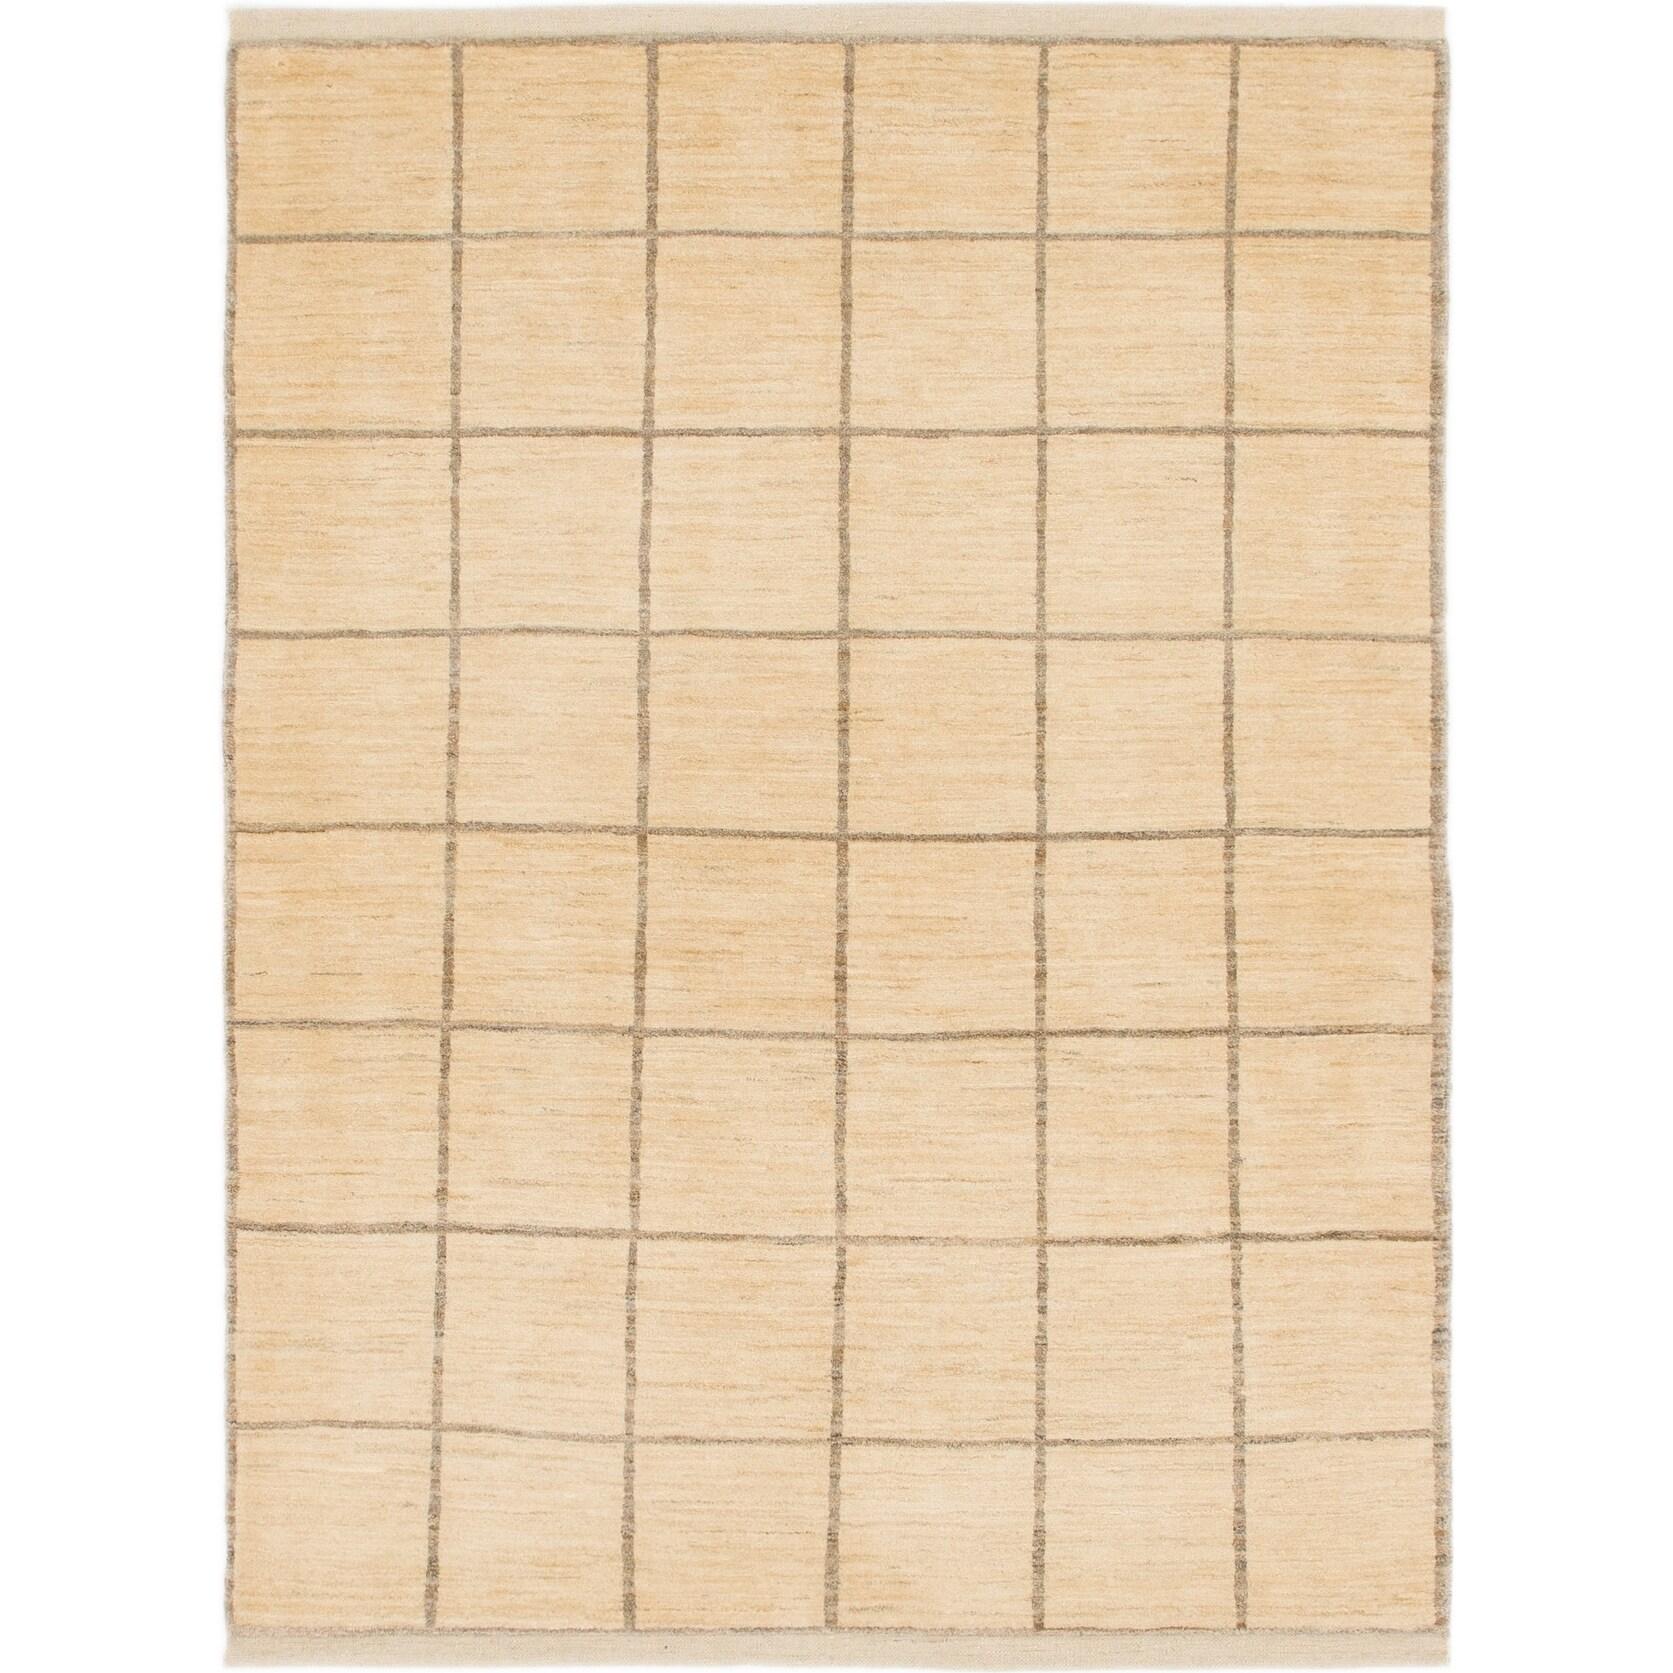 Hand Knotted Kashkuli Gabbeh Wool Area Rug - 5 x 6 10 (Cream - 5 x 6 10)